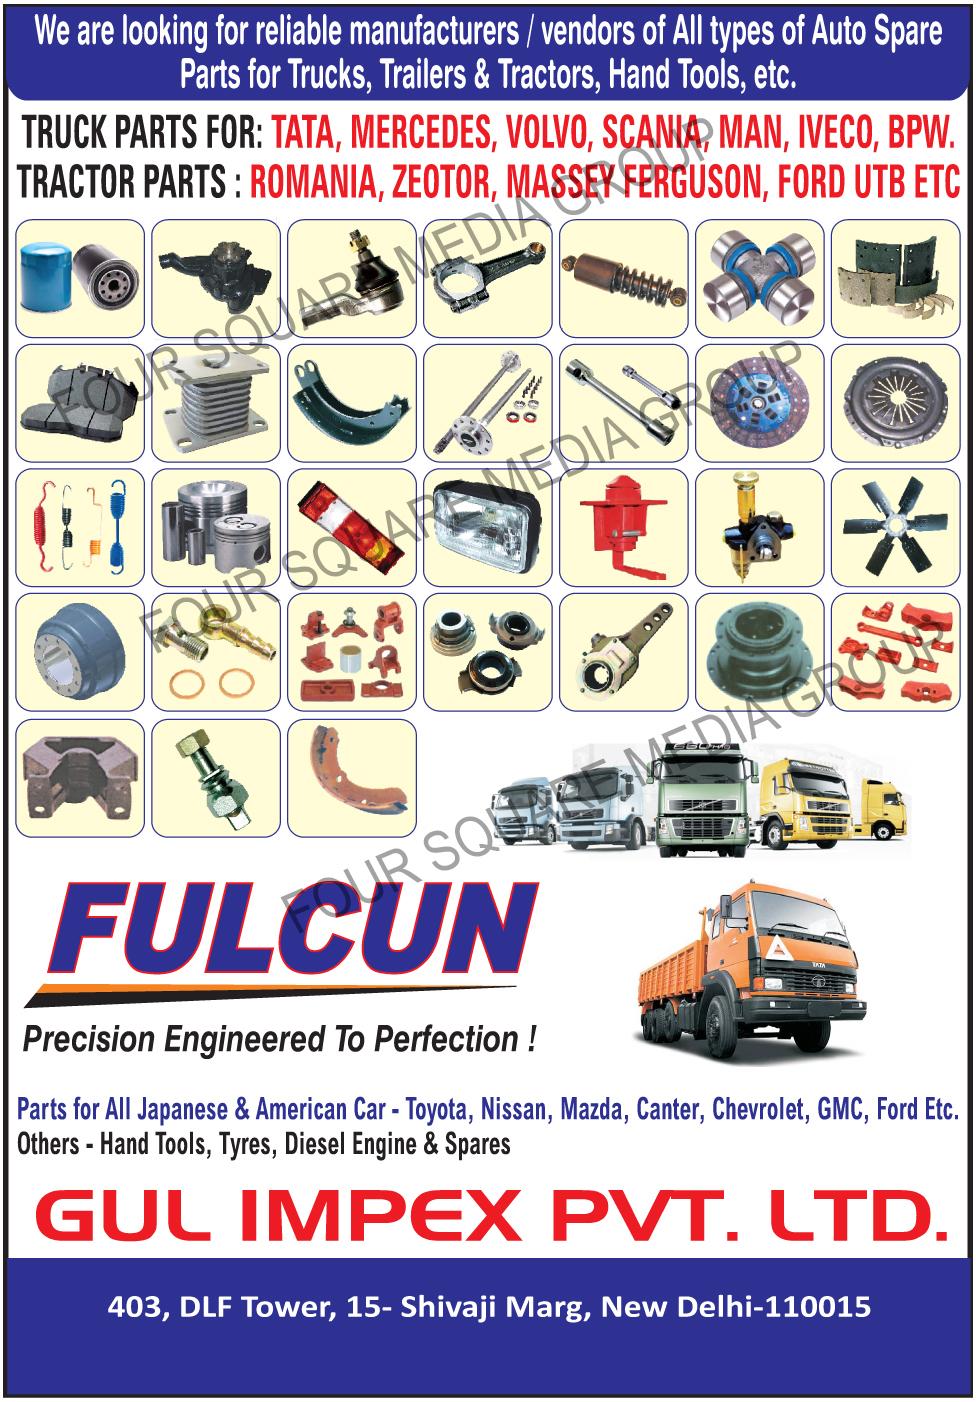 Truck Parts, Tractor Parts, Car Parts, Hand Tools, Tyres, Diesel Engines, Automotive Spare Parts